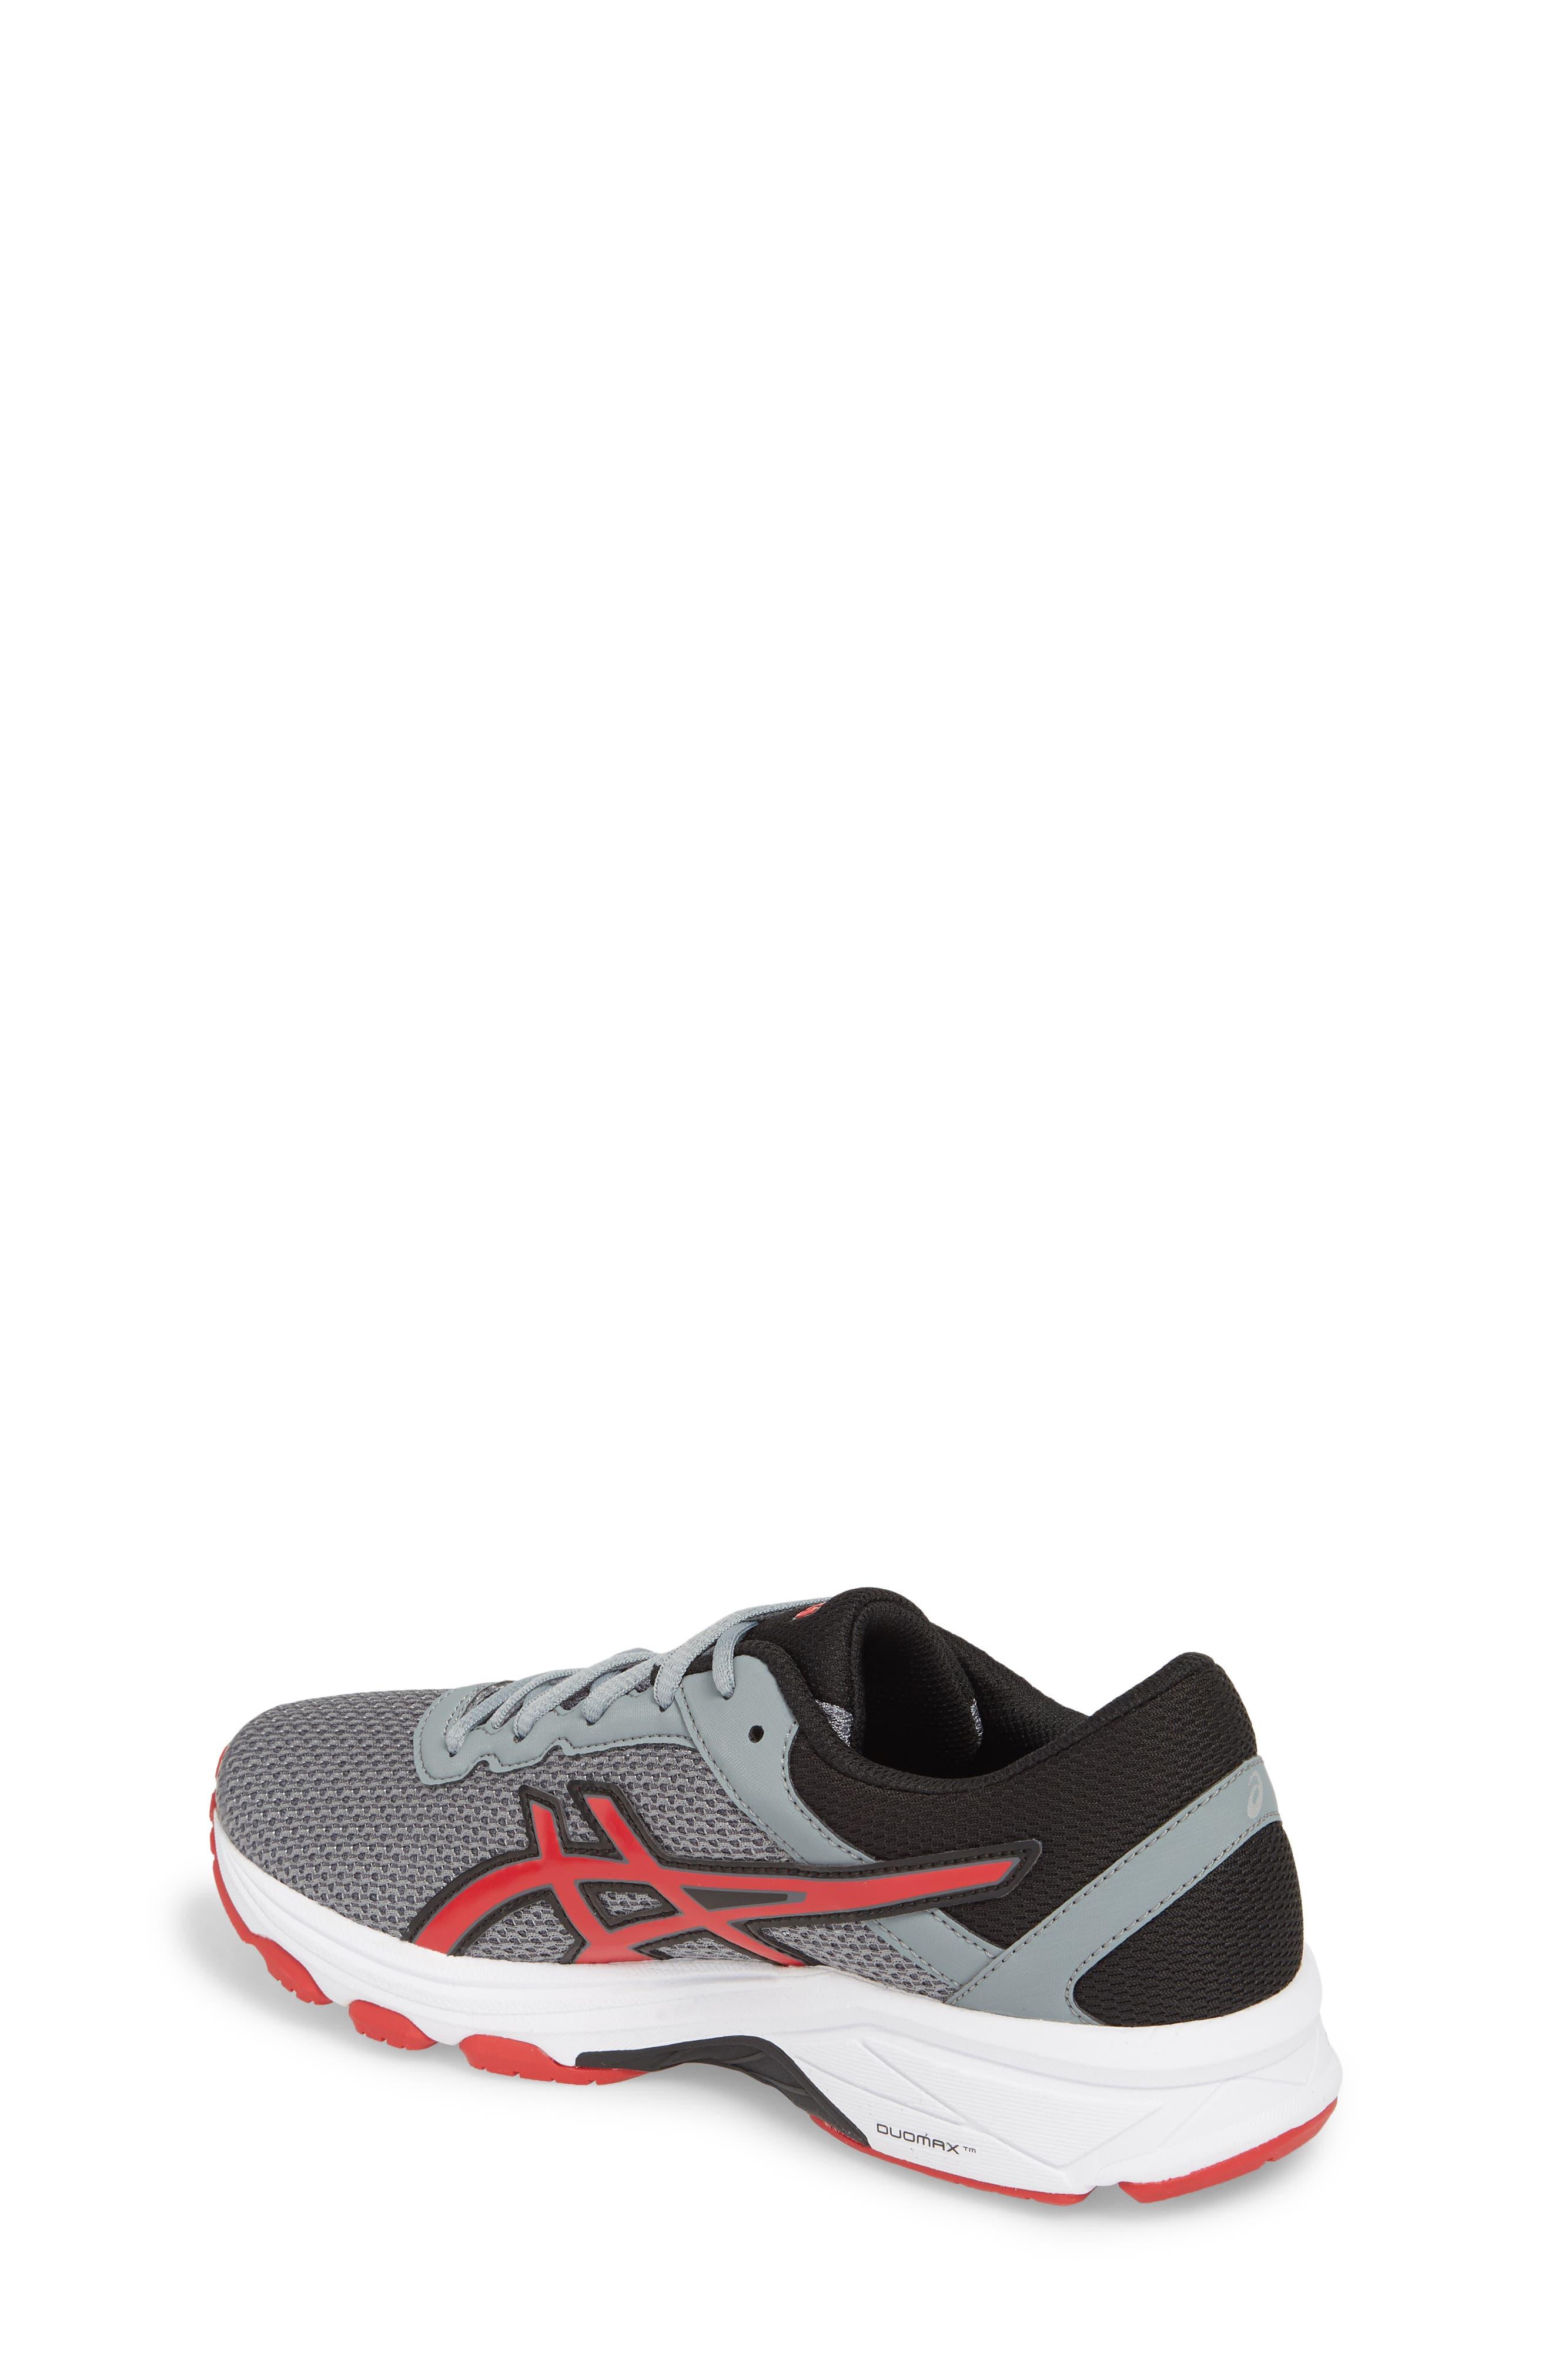 Asics GT-1000<sup>™</sup> 6 GS Sneaker,                             Alternate thumbnail 2, color,                             023